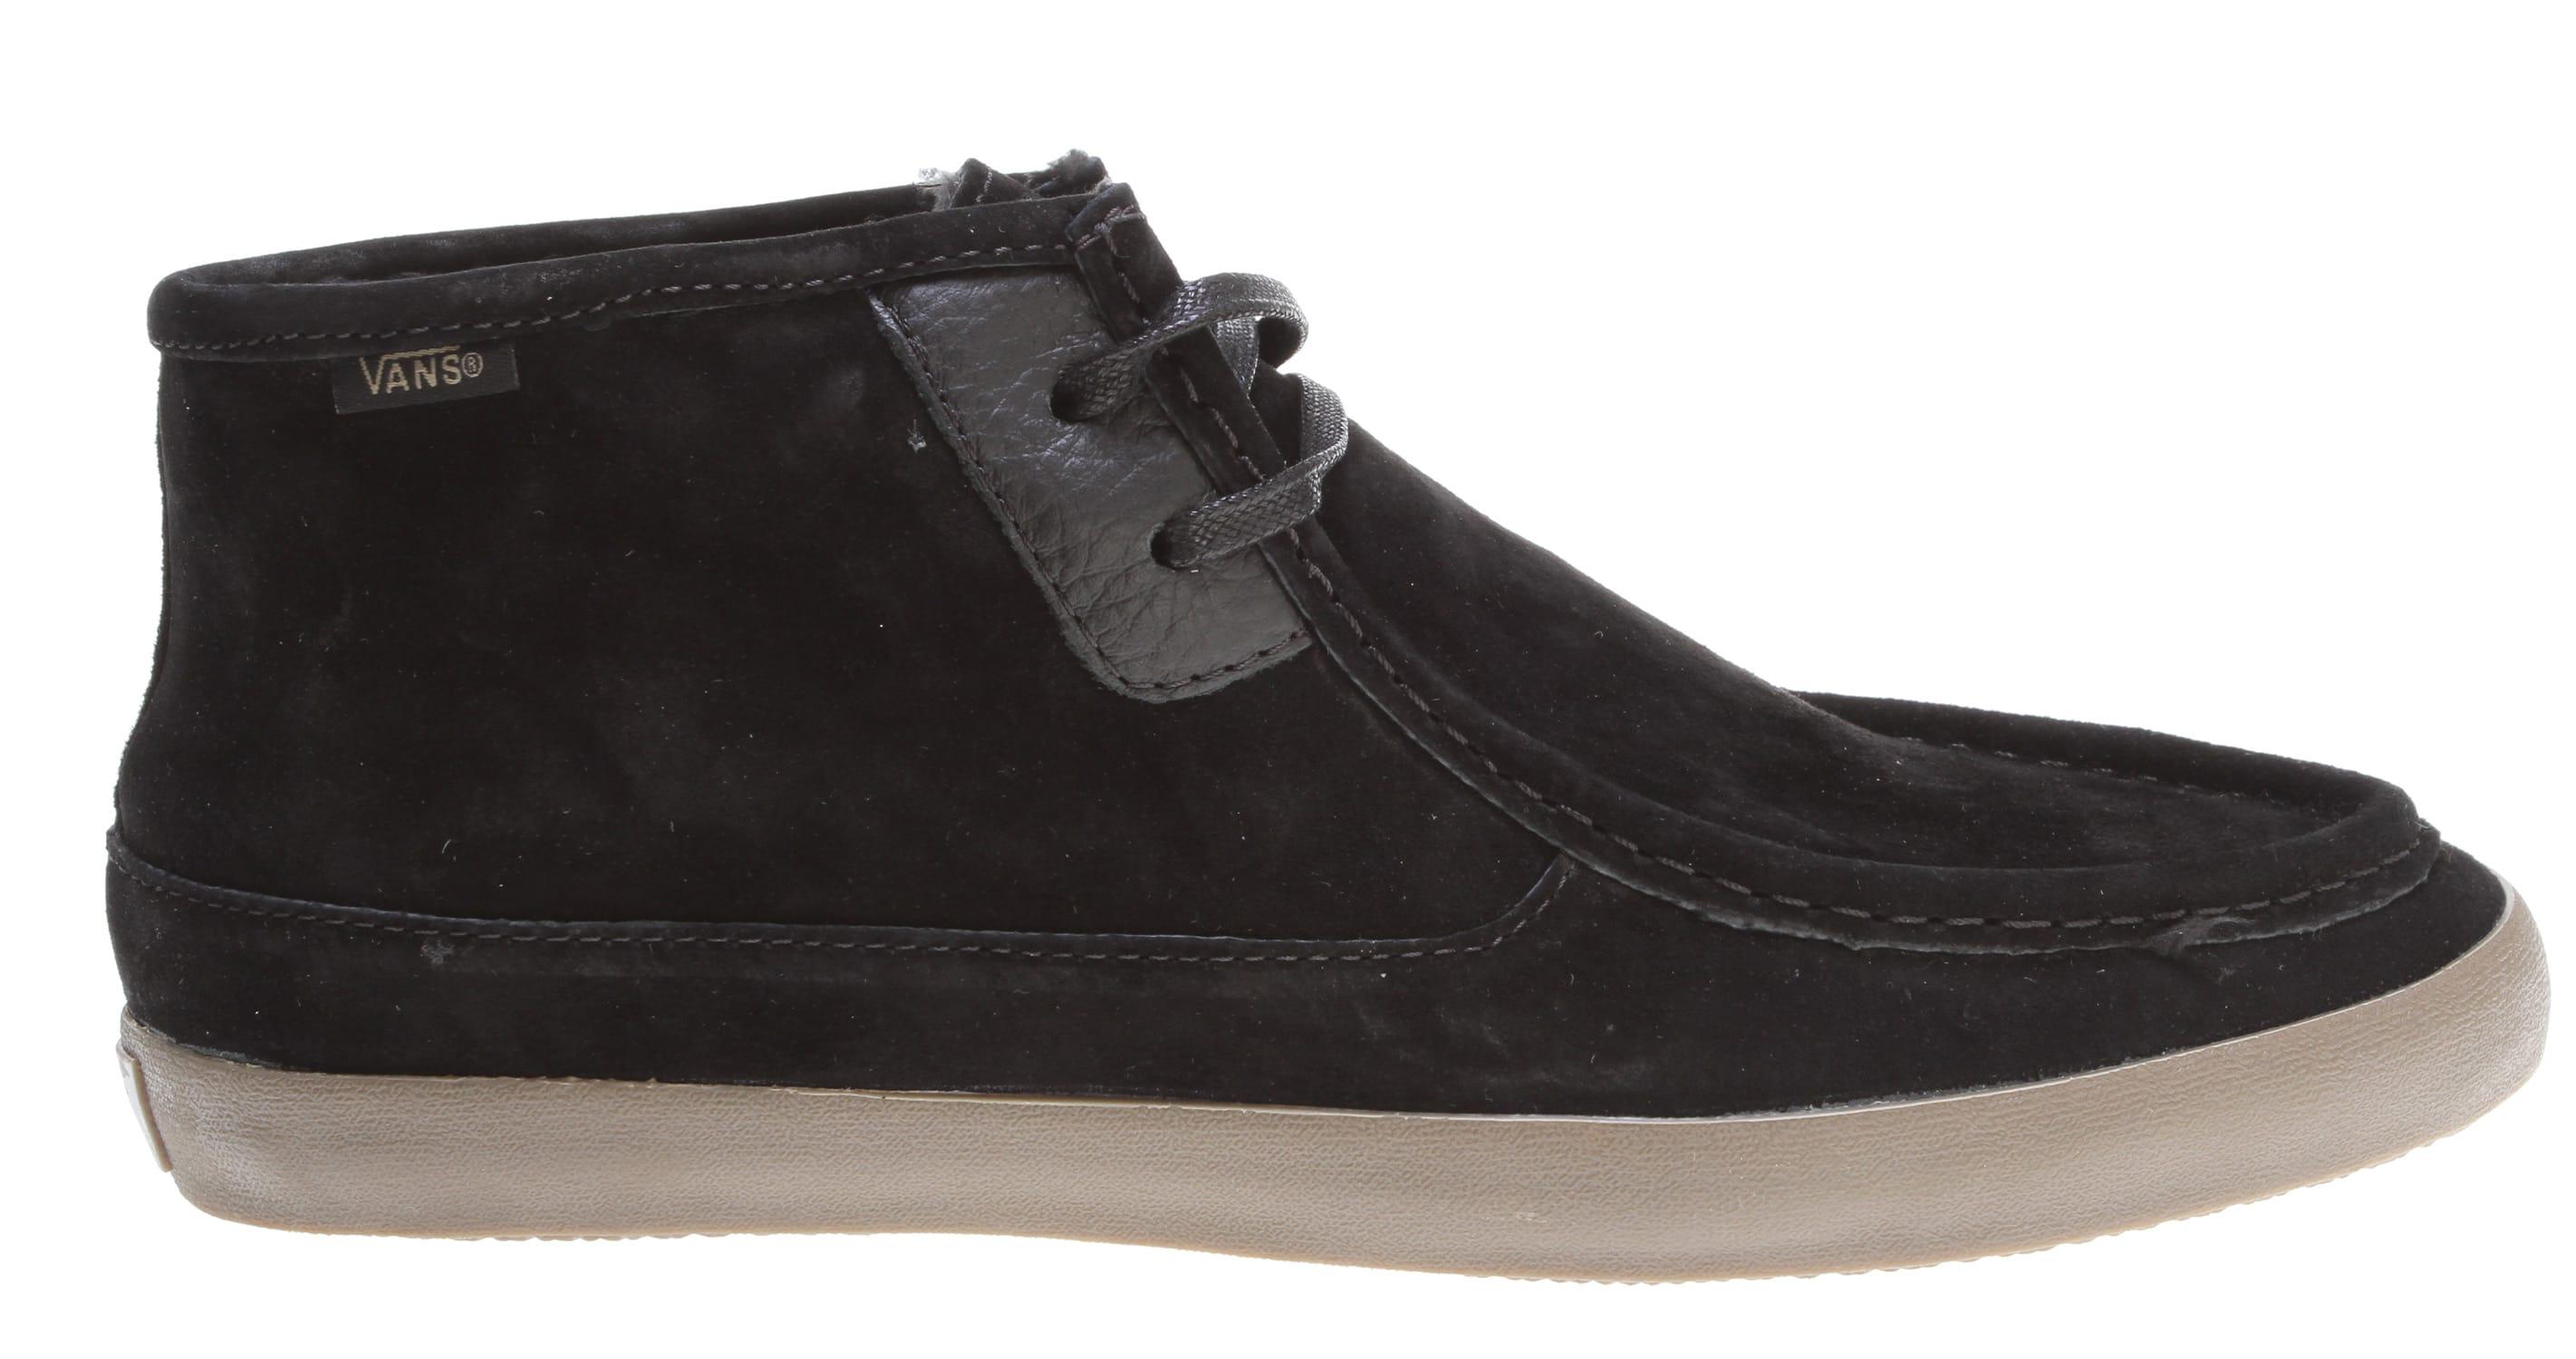 c83e63954e Vans Rata Mid Shoes - thumbnail 1